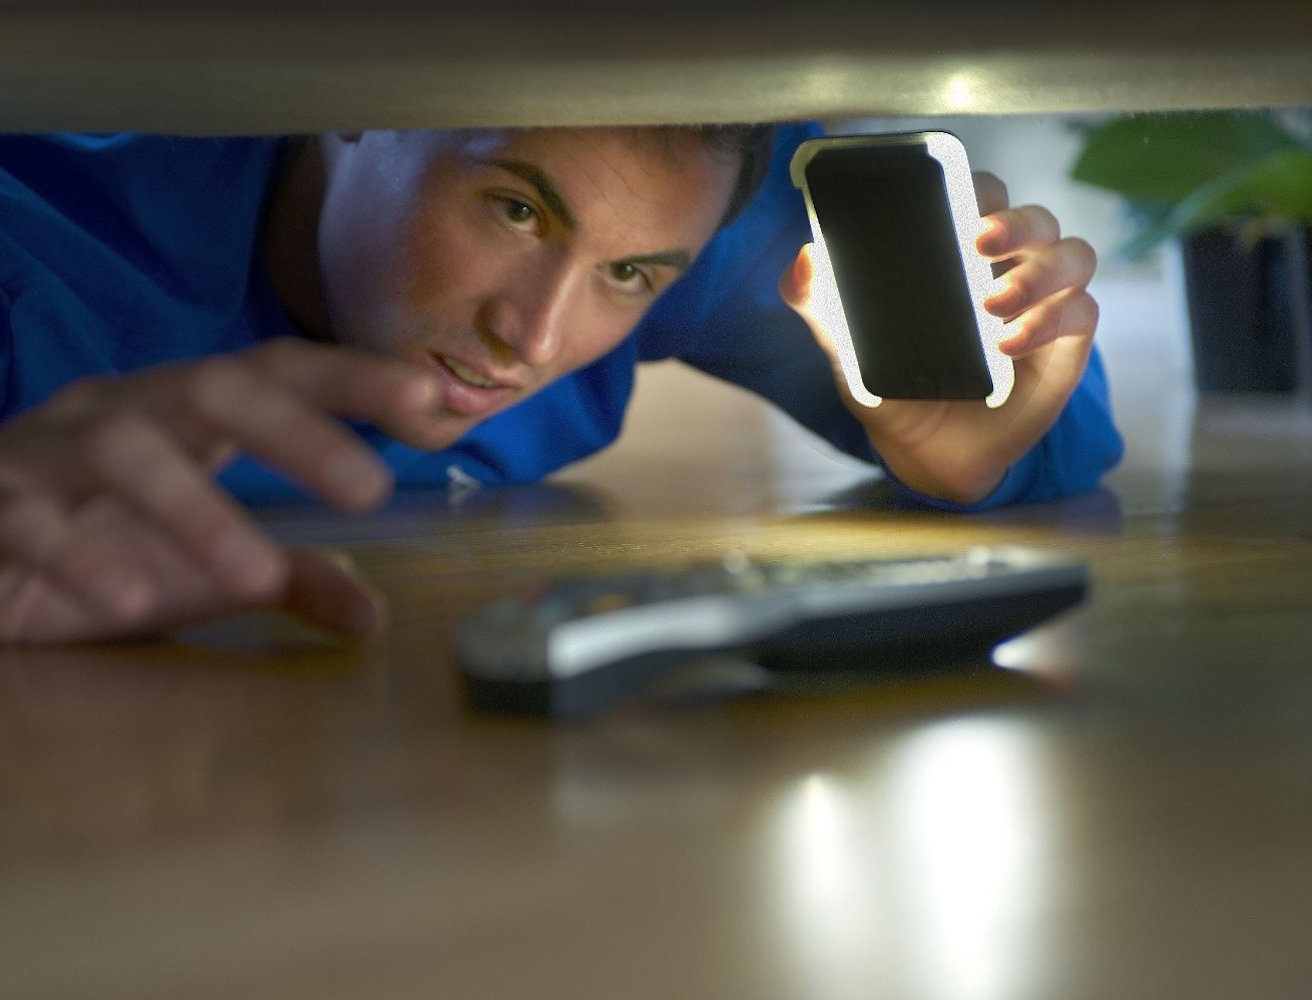 LuMee – The Illuminated Smartphone Case